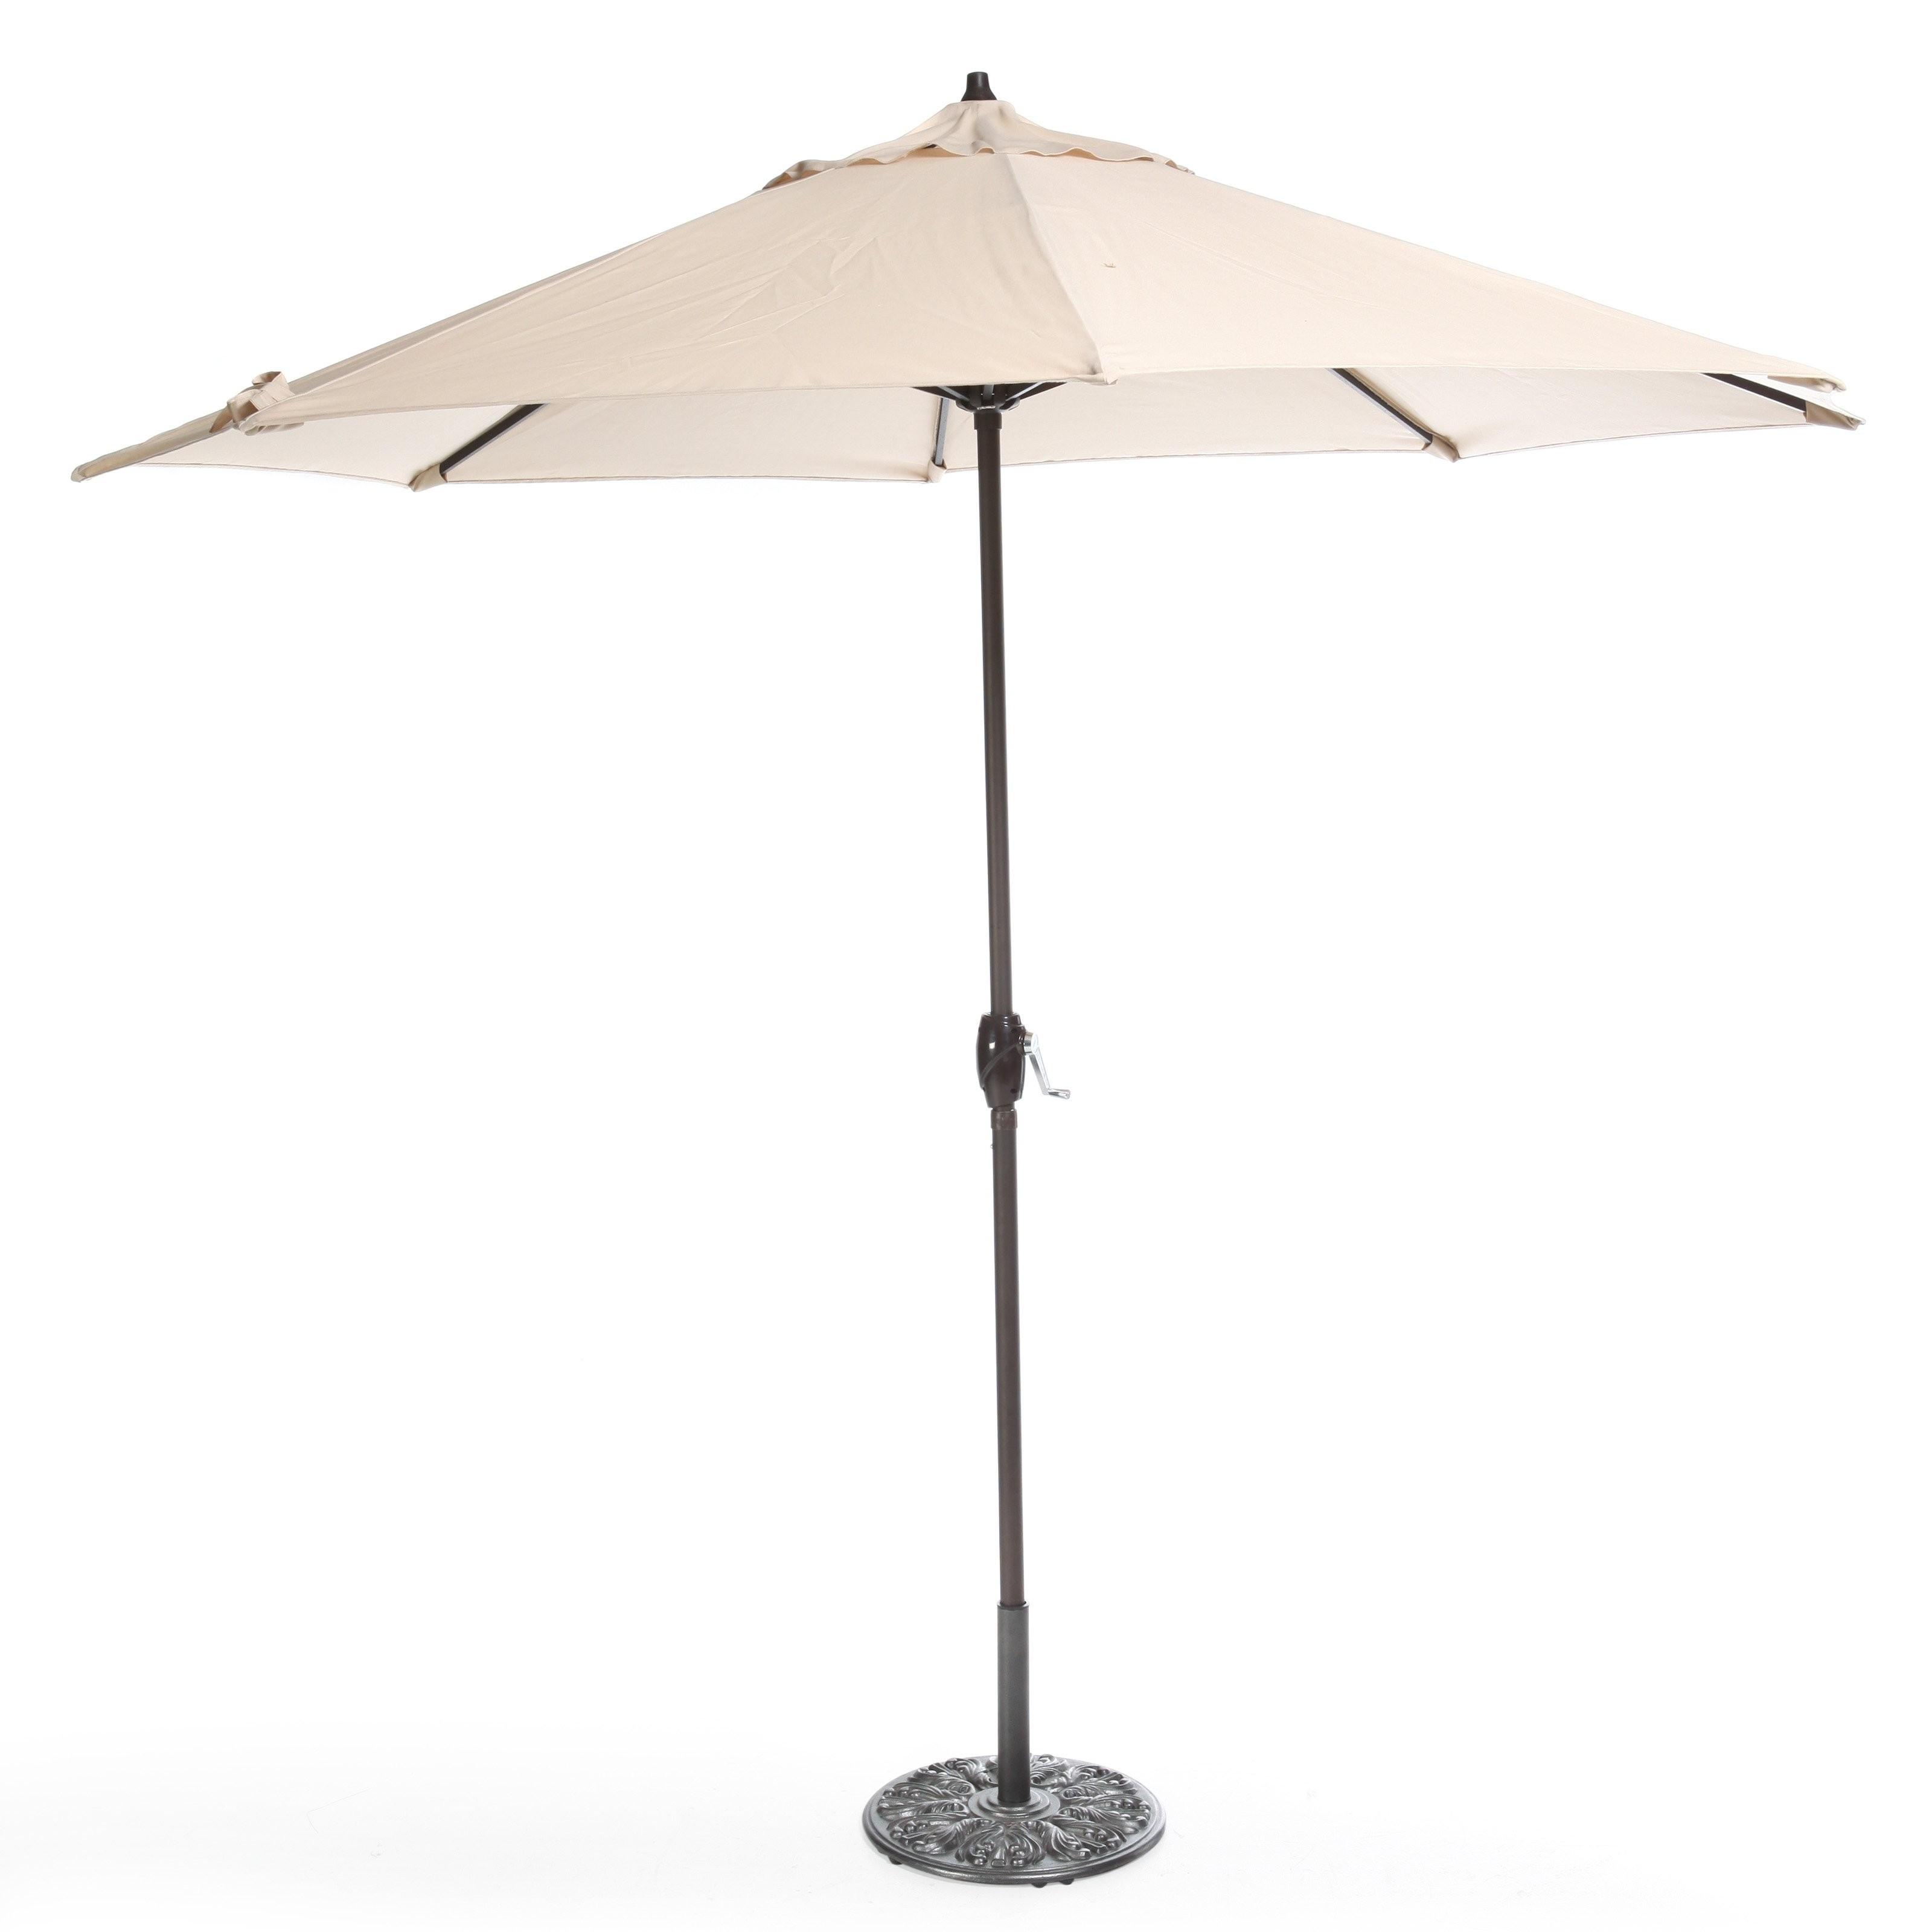 Kmart Patio Umbrellas With Famous Kmart Floor Lamp Fresh Patio Umbrellas At Walmart Fortable Patio (View 19 of 20)